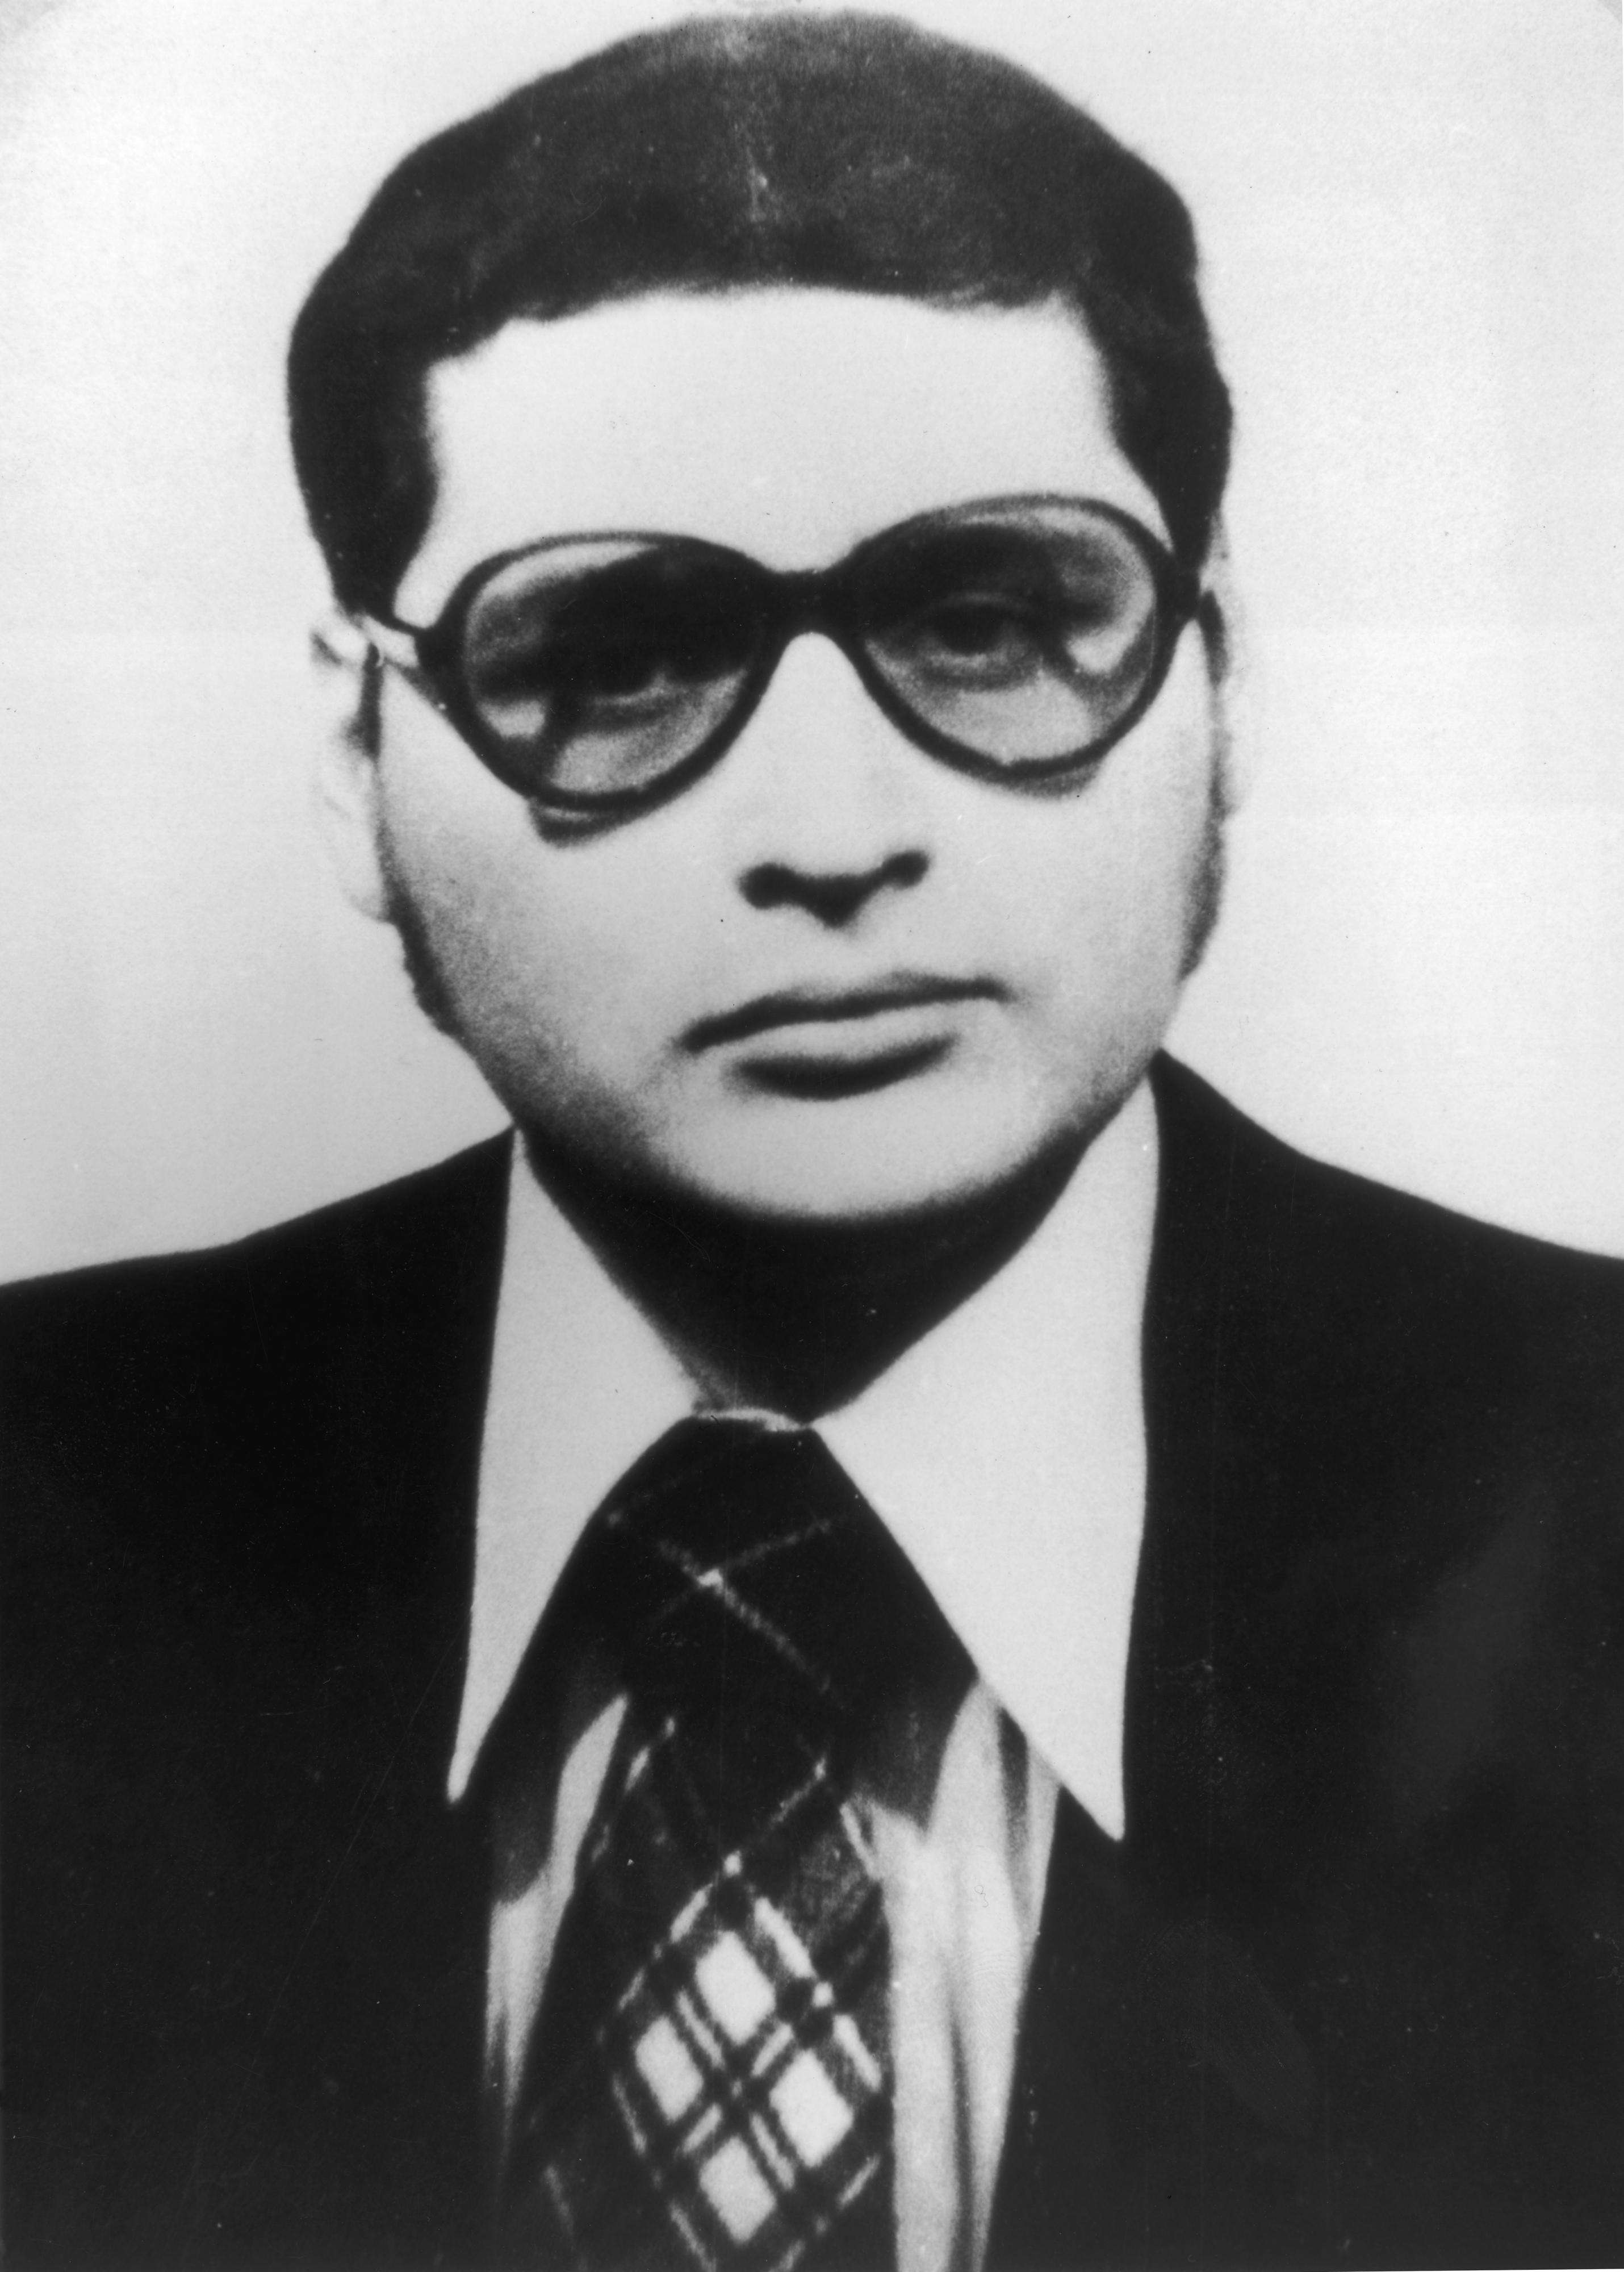 Carlos, o Chacal, foi condenado à prisão perpétua Foto: Hulton Archive/Getty Images